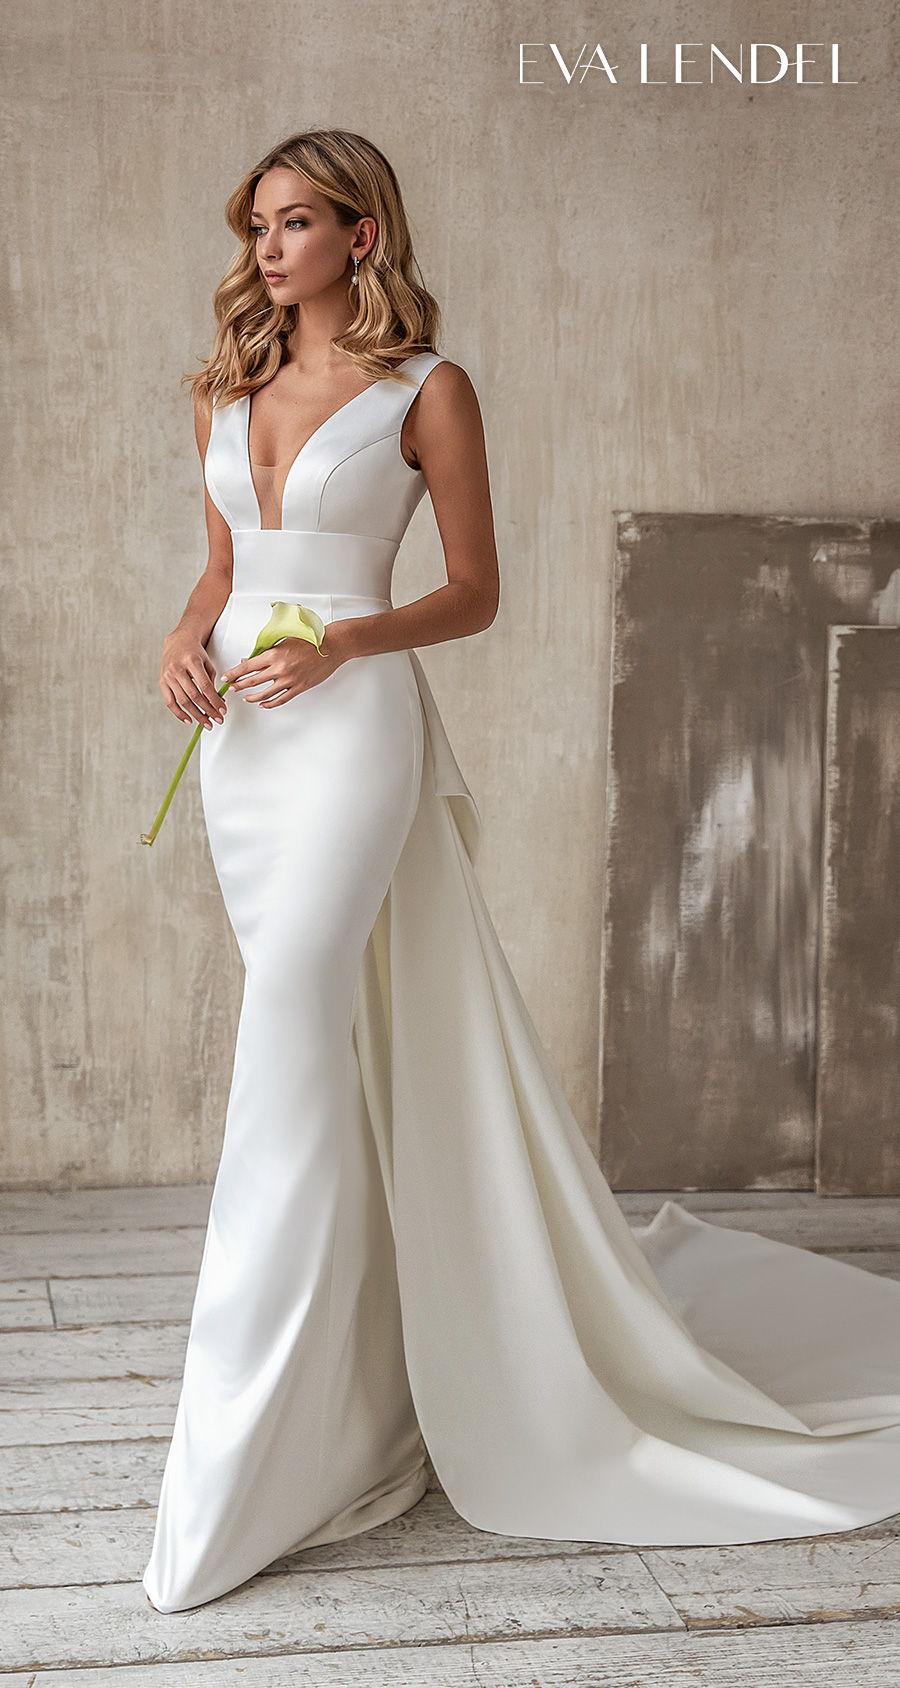 eva lendel 2021 bridal sleeveless deep v neck simple minimalist elegant modern fit and flare wedding dress backless ribbon back chapel train (debora) mv